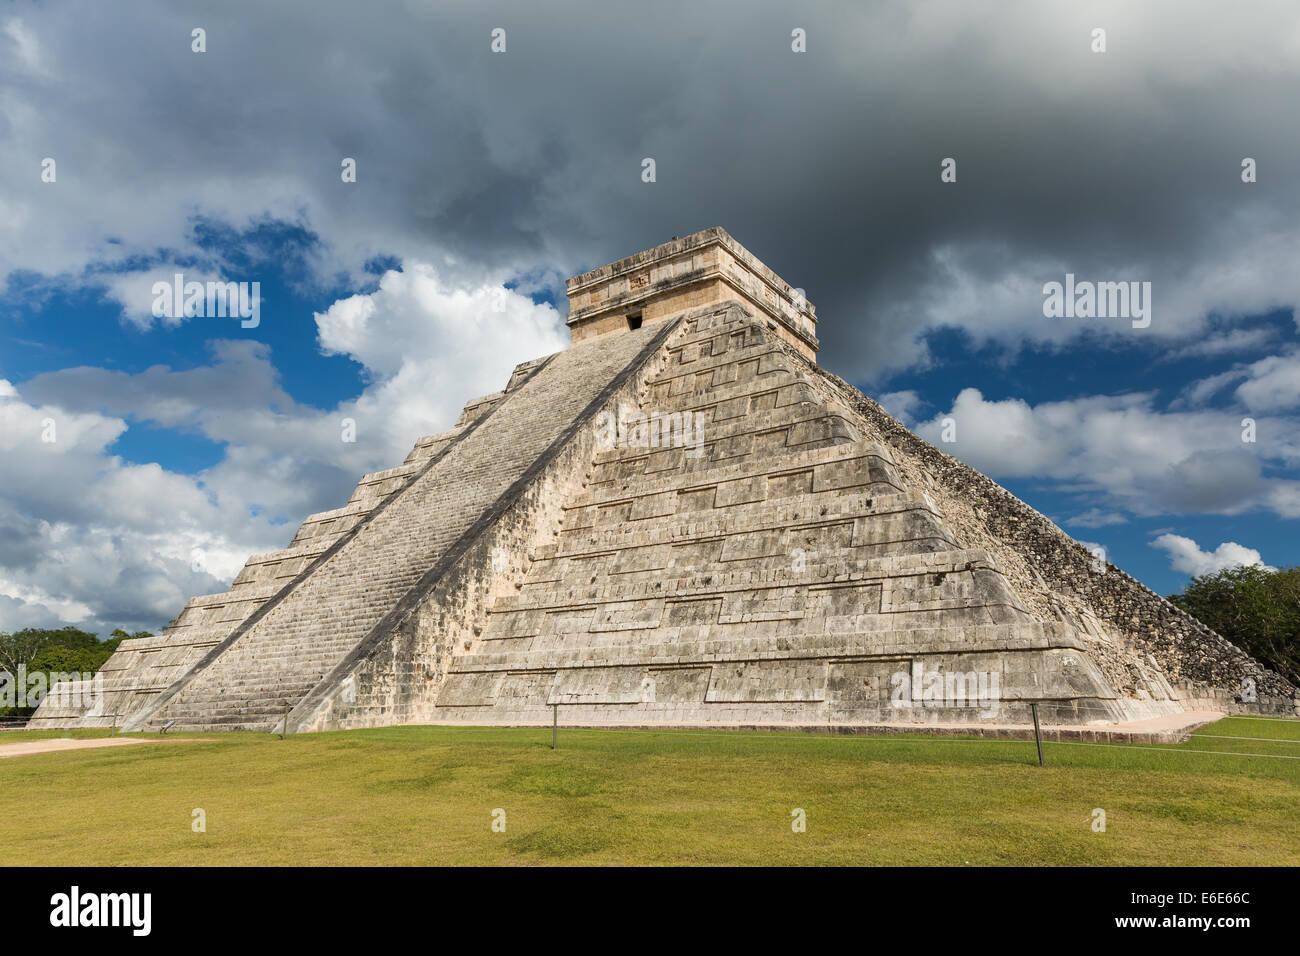 Pyramid of Kukulkan, Chichen Itza, Mexico - Stock Image